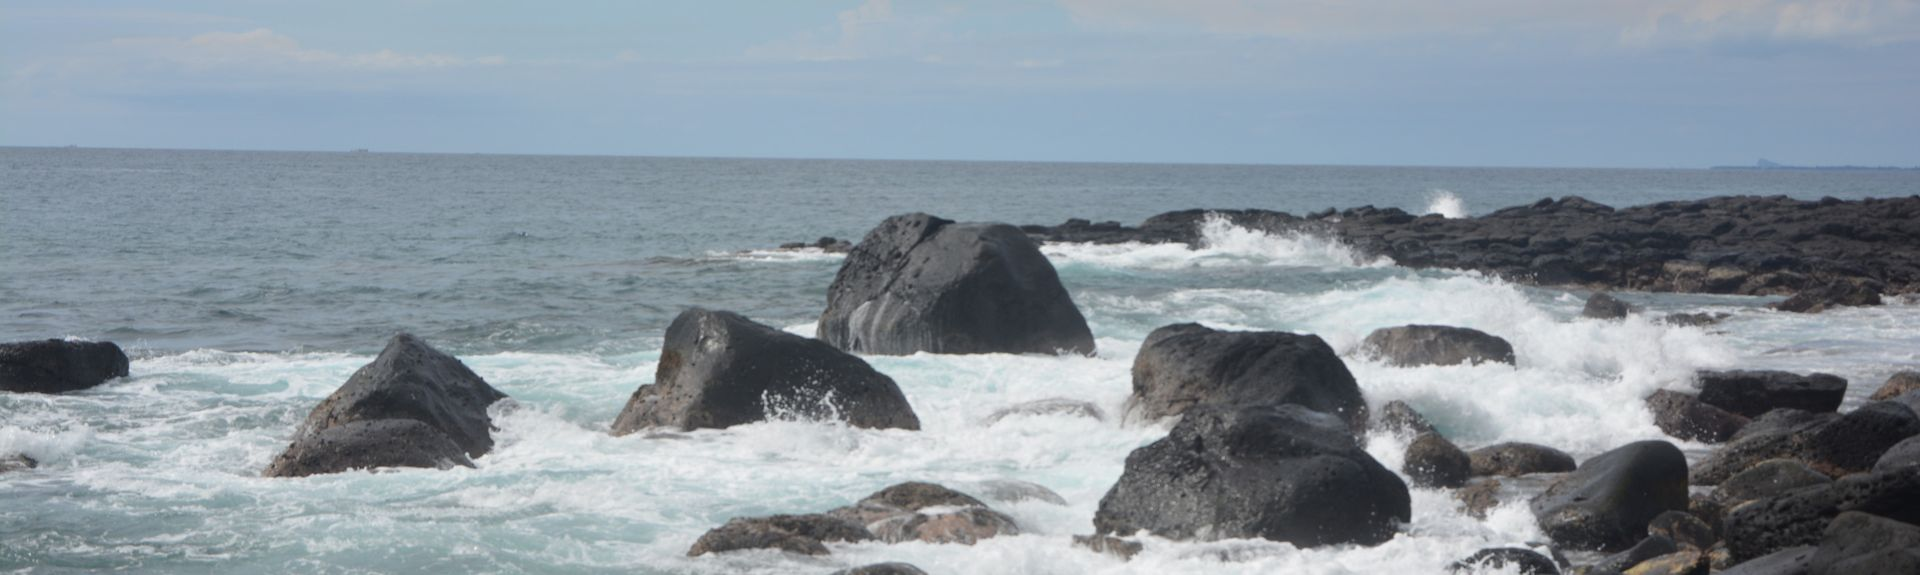 Strand von Pereybere, Grand Baie, Rivière du Rempart, Mauritius